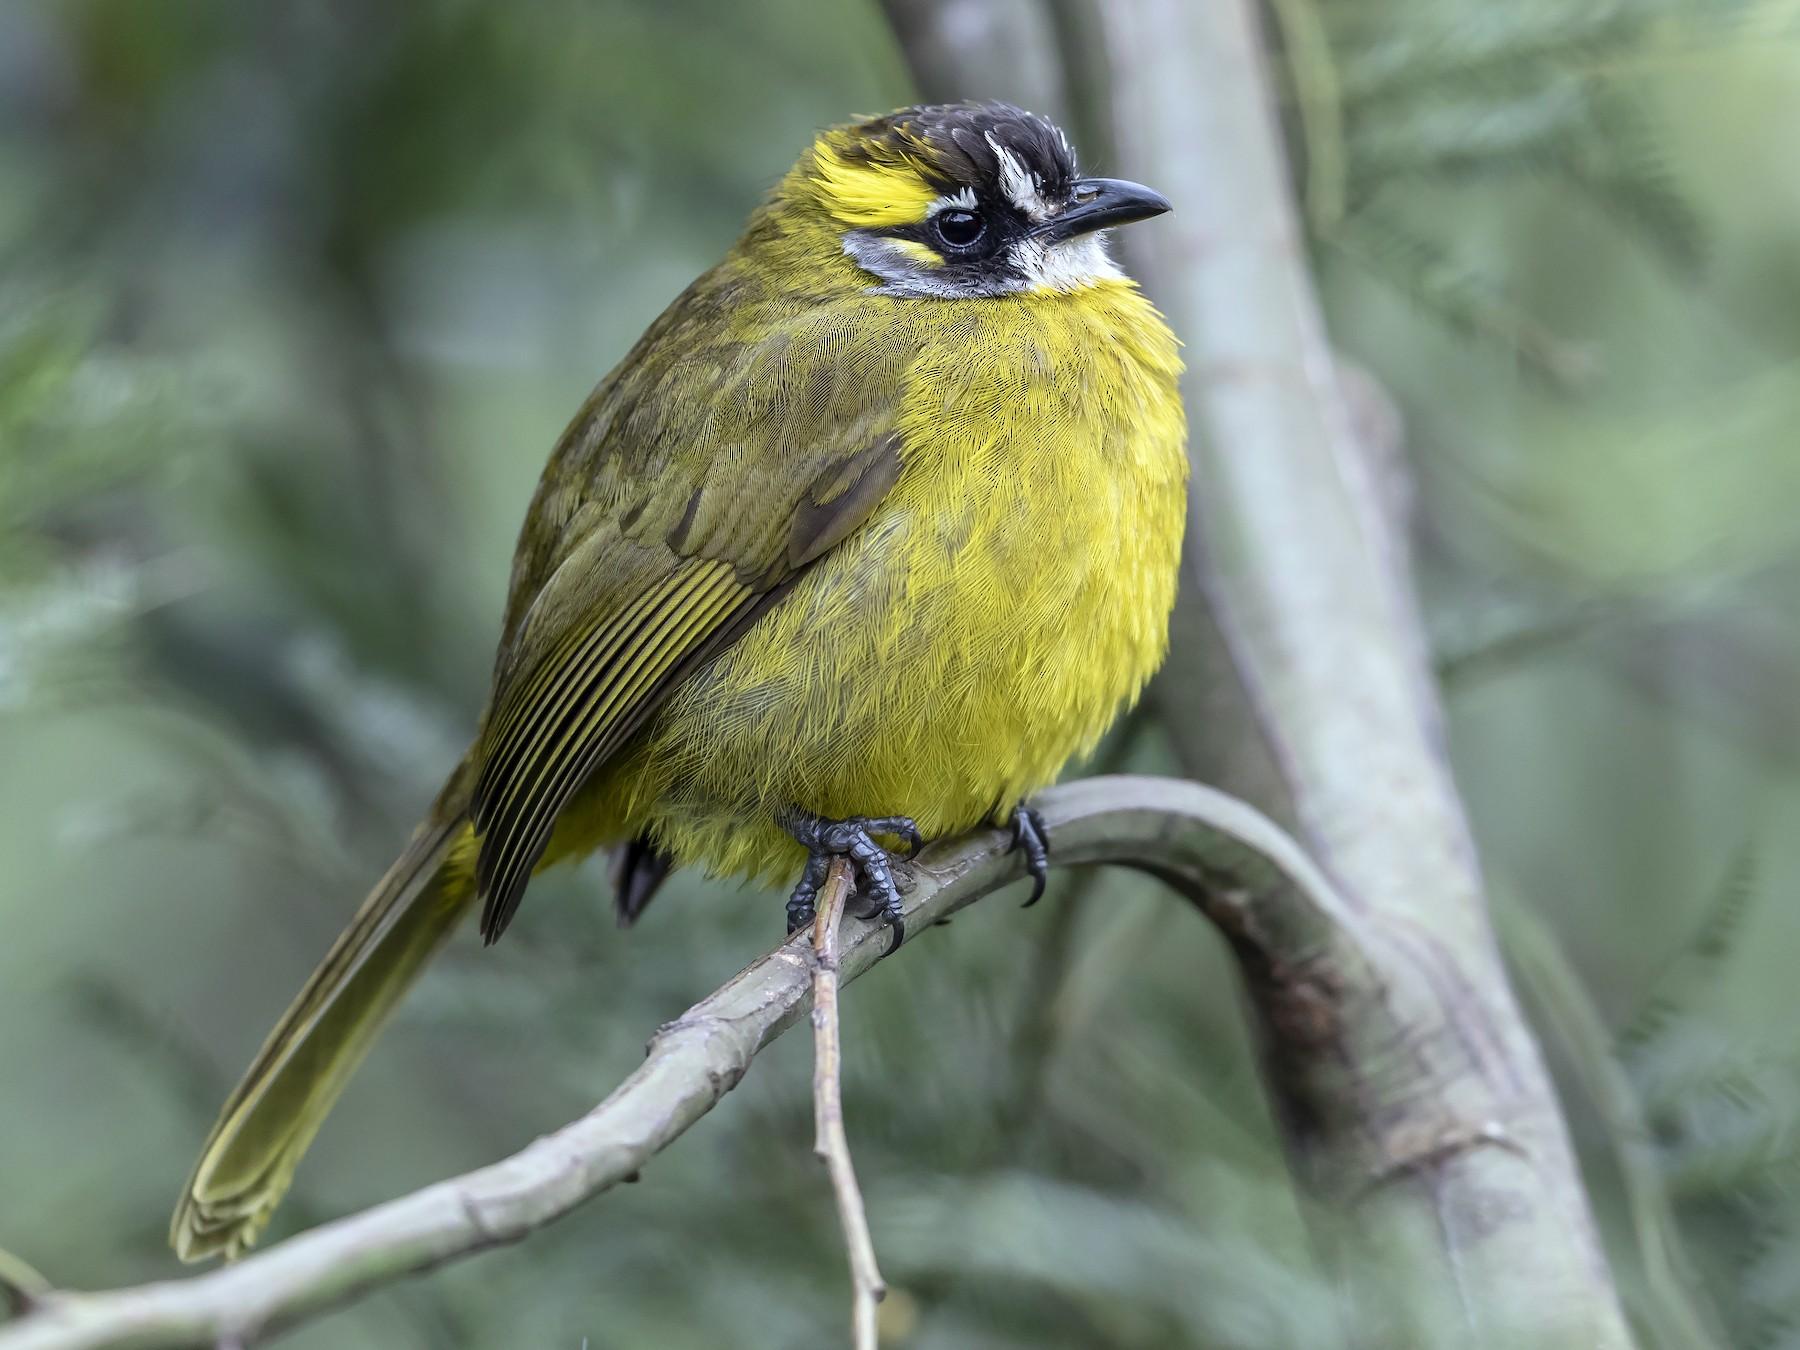 Yellow-eared Bulbul - Jieles van Baalen